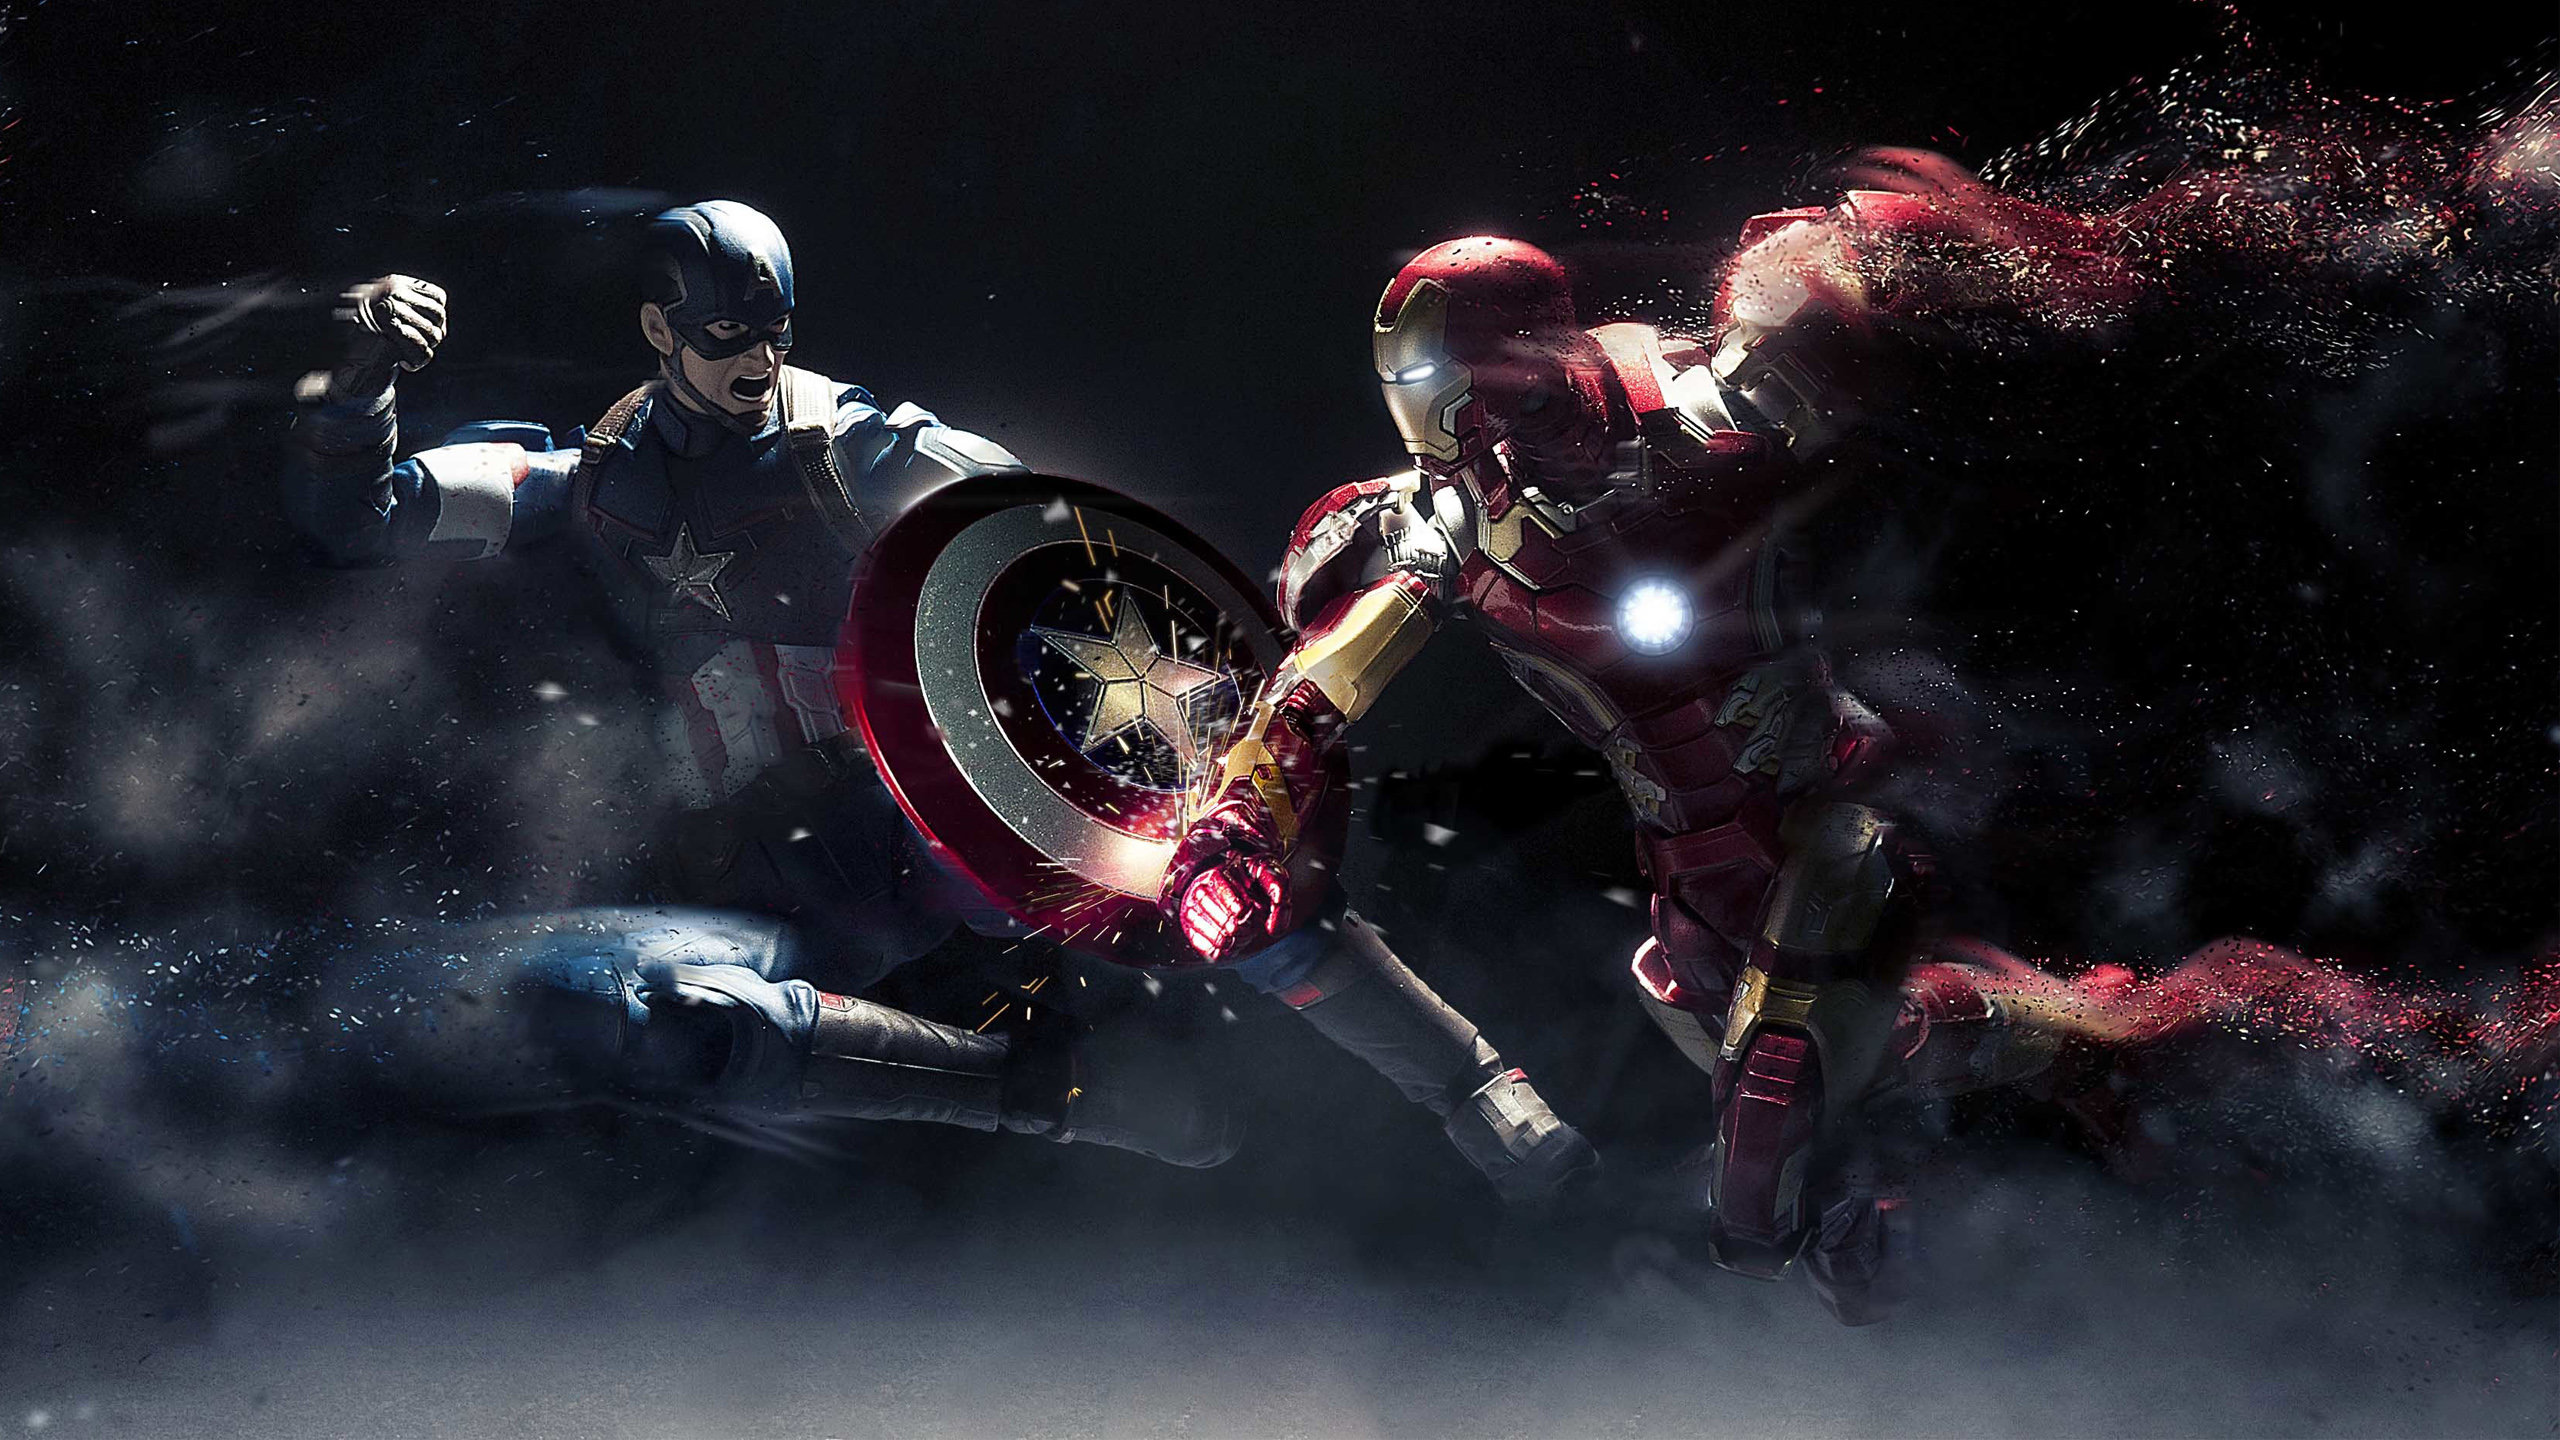 captain america: civil war wallpapers 2560x1440 desktop backgrounds